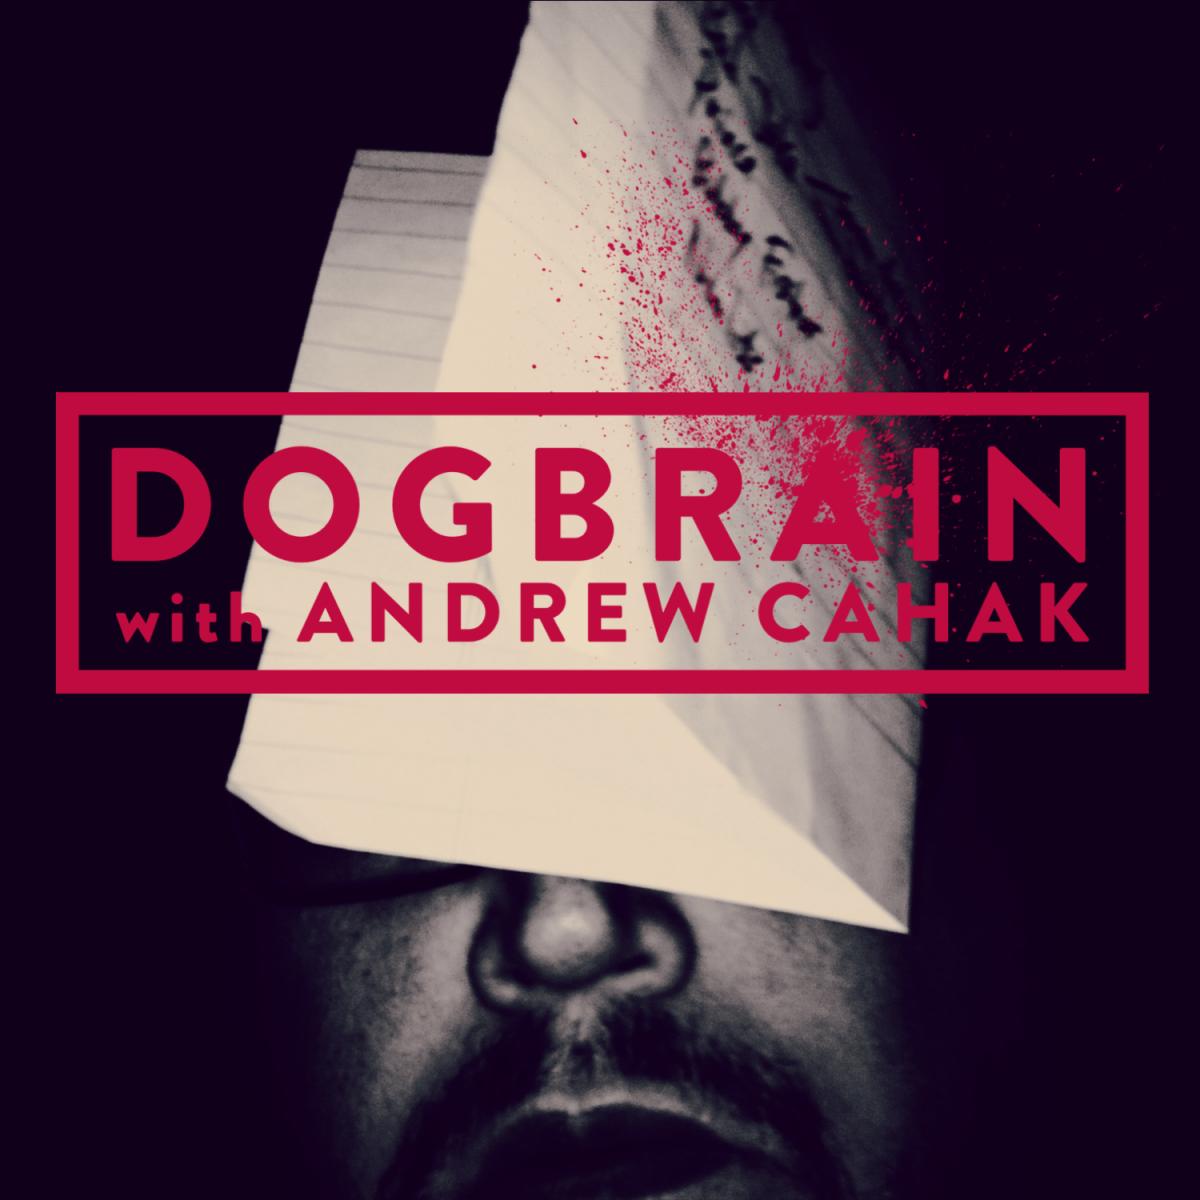 DogBrain with Andrew Cahak